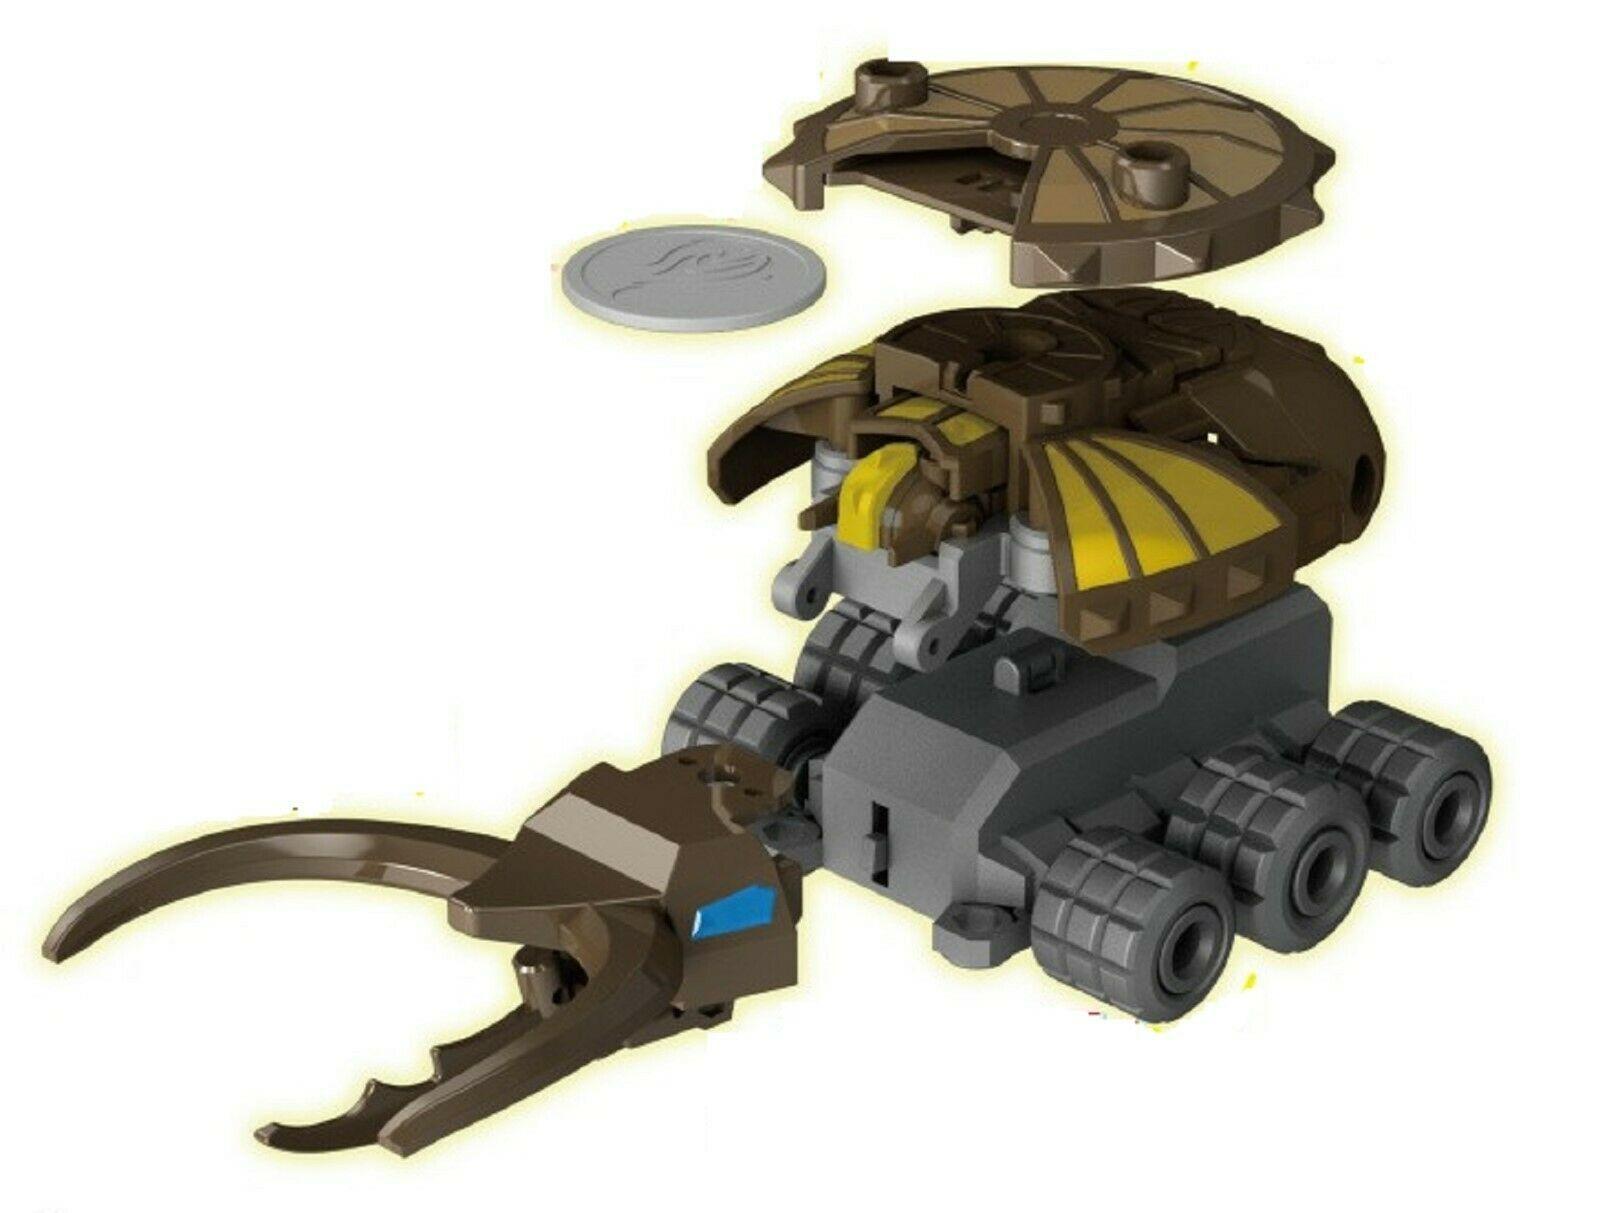 Bugsbot Ignition Basic B-06 Battle Caucasus Action Figure Battling Bug Toy